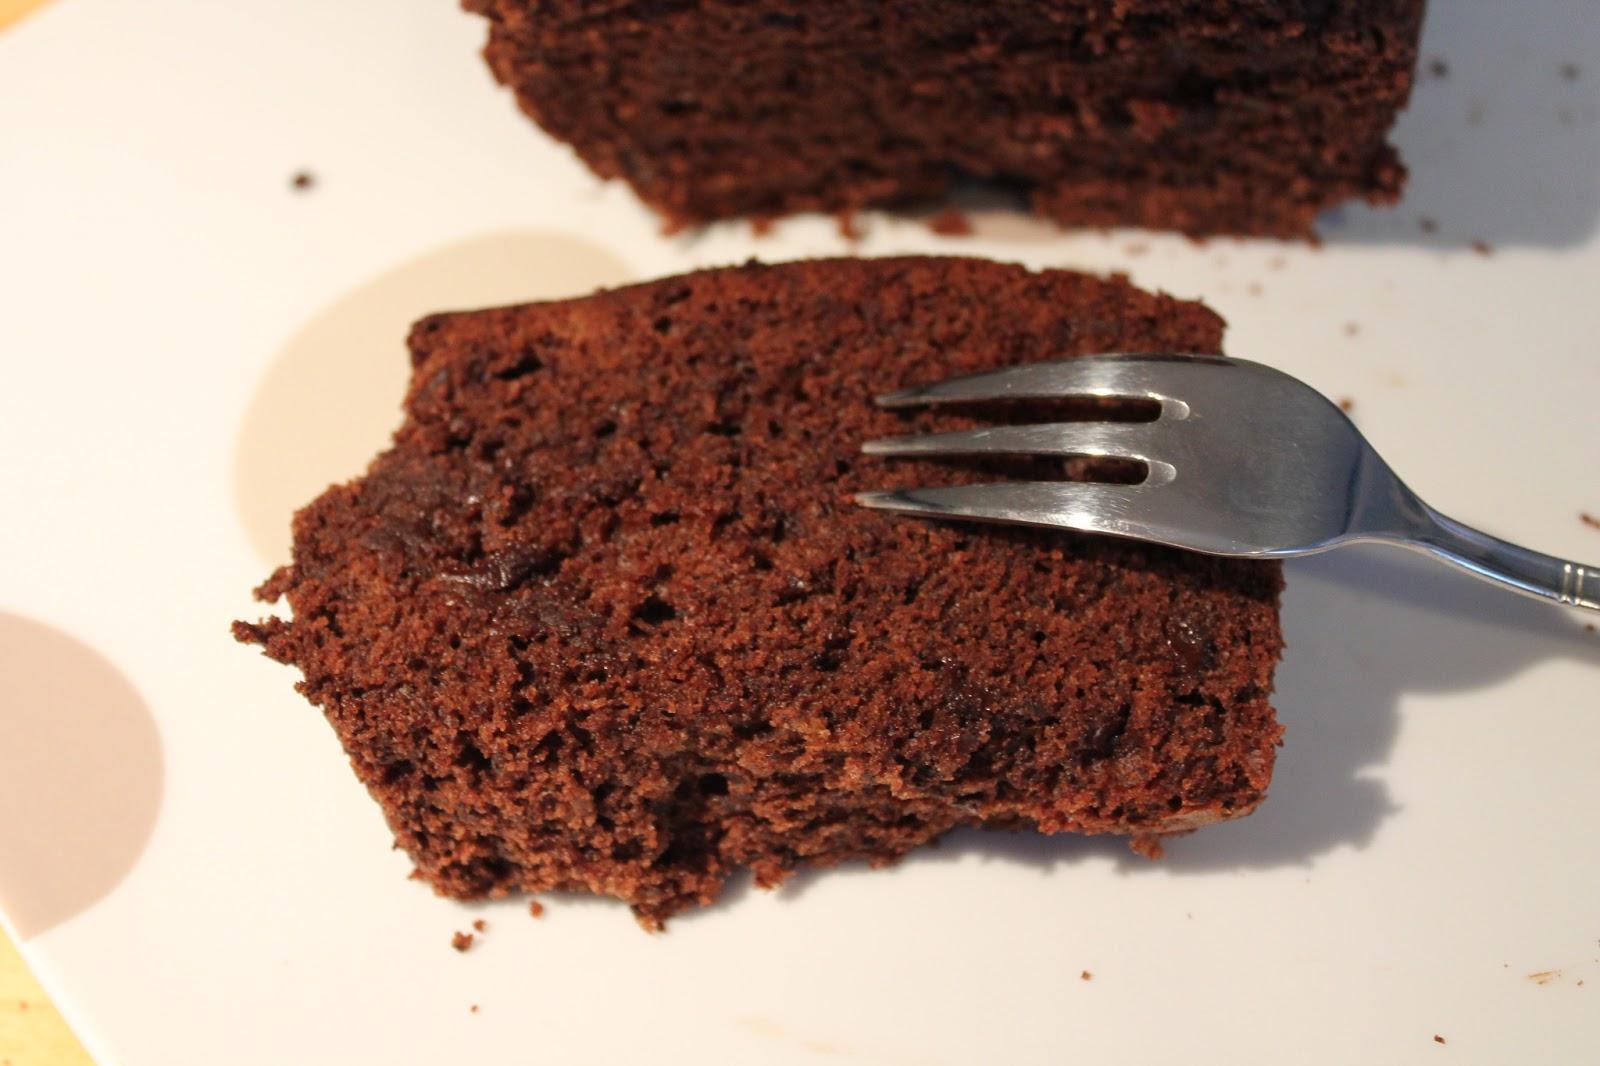 Cake chocolat fleur de sel pierre herm for Cake au chocolat pierre herme